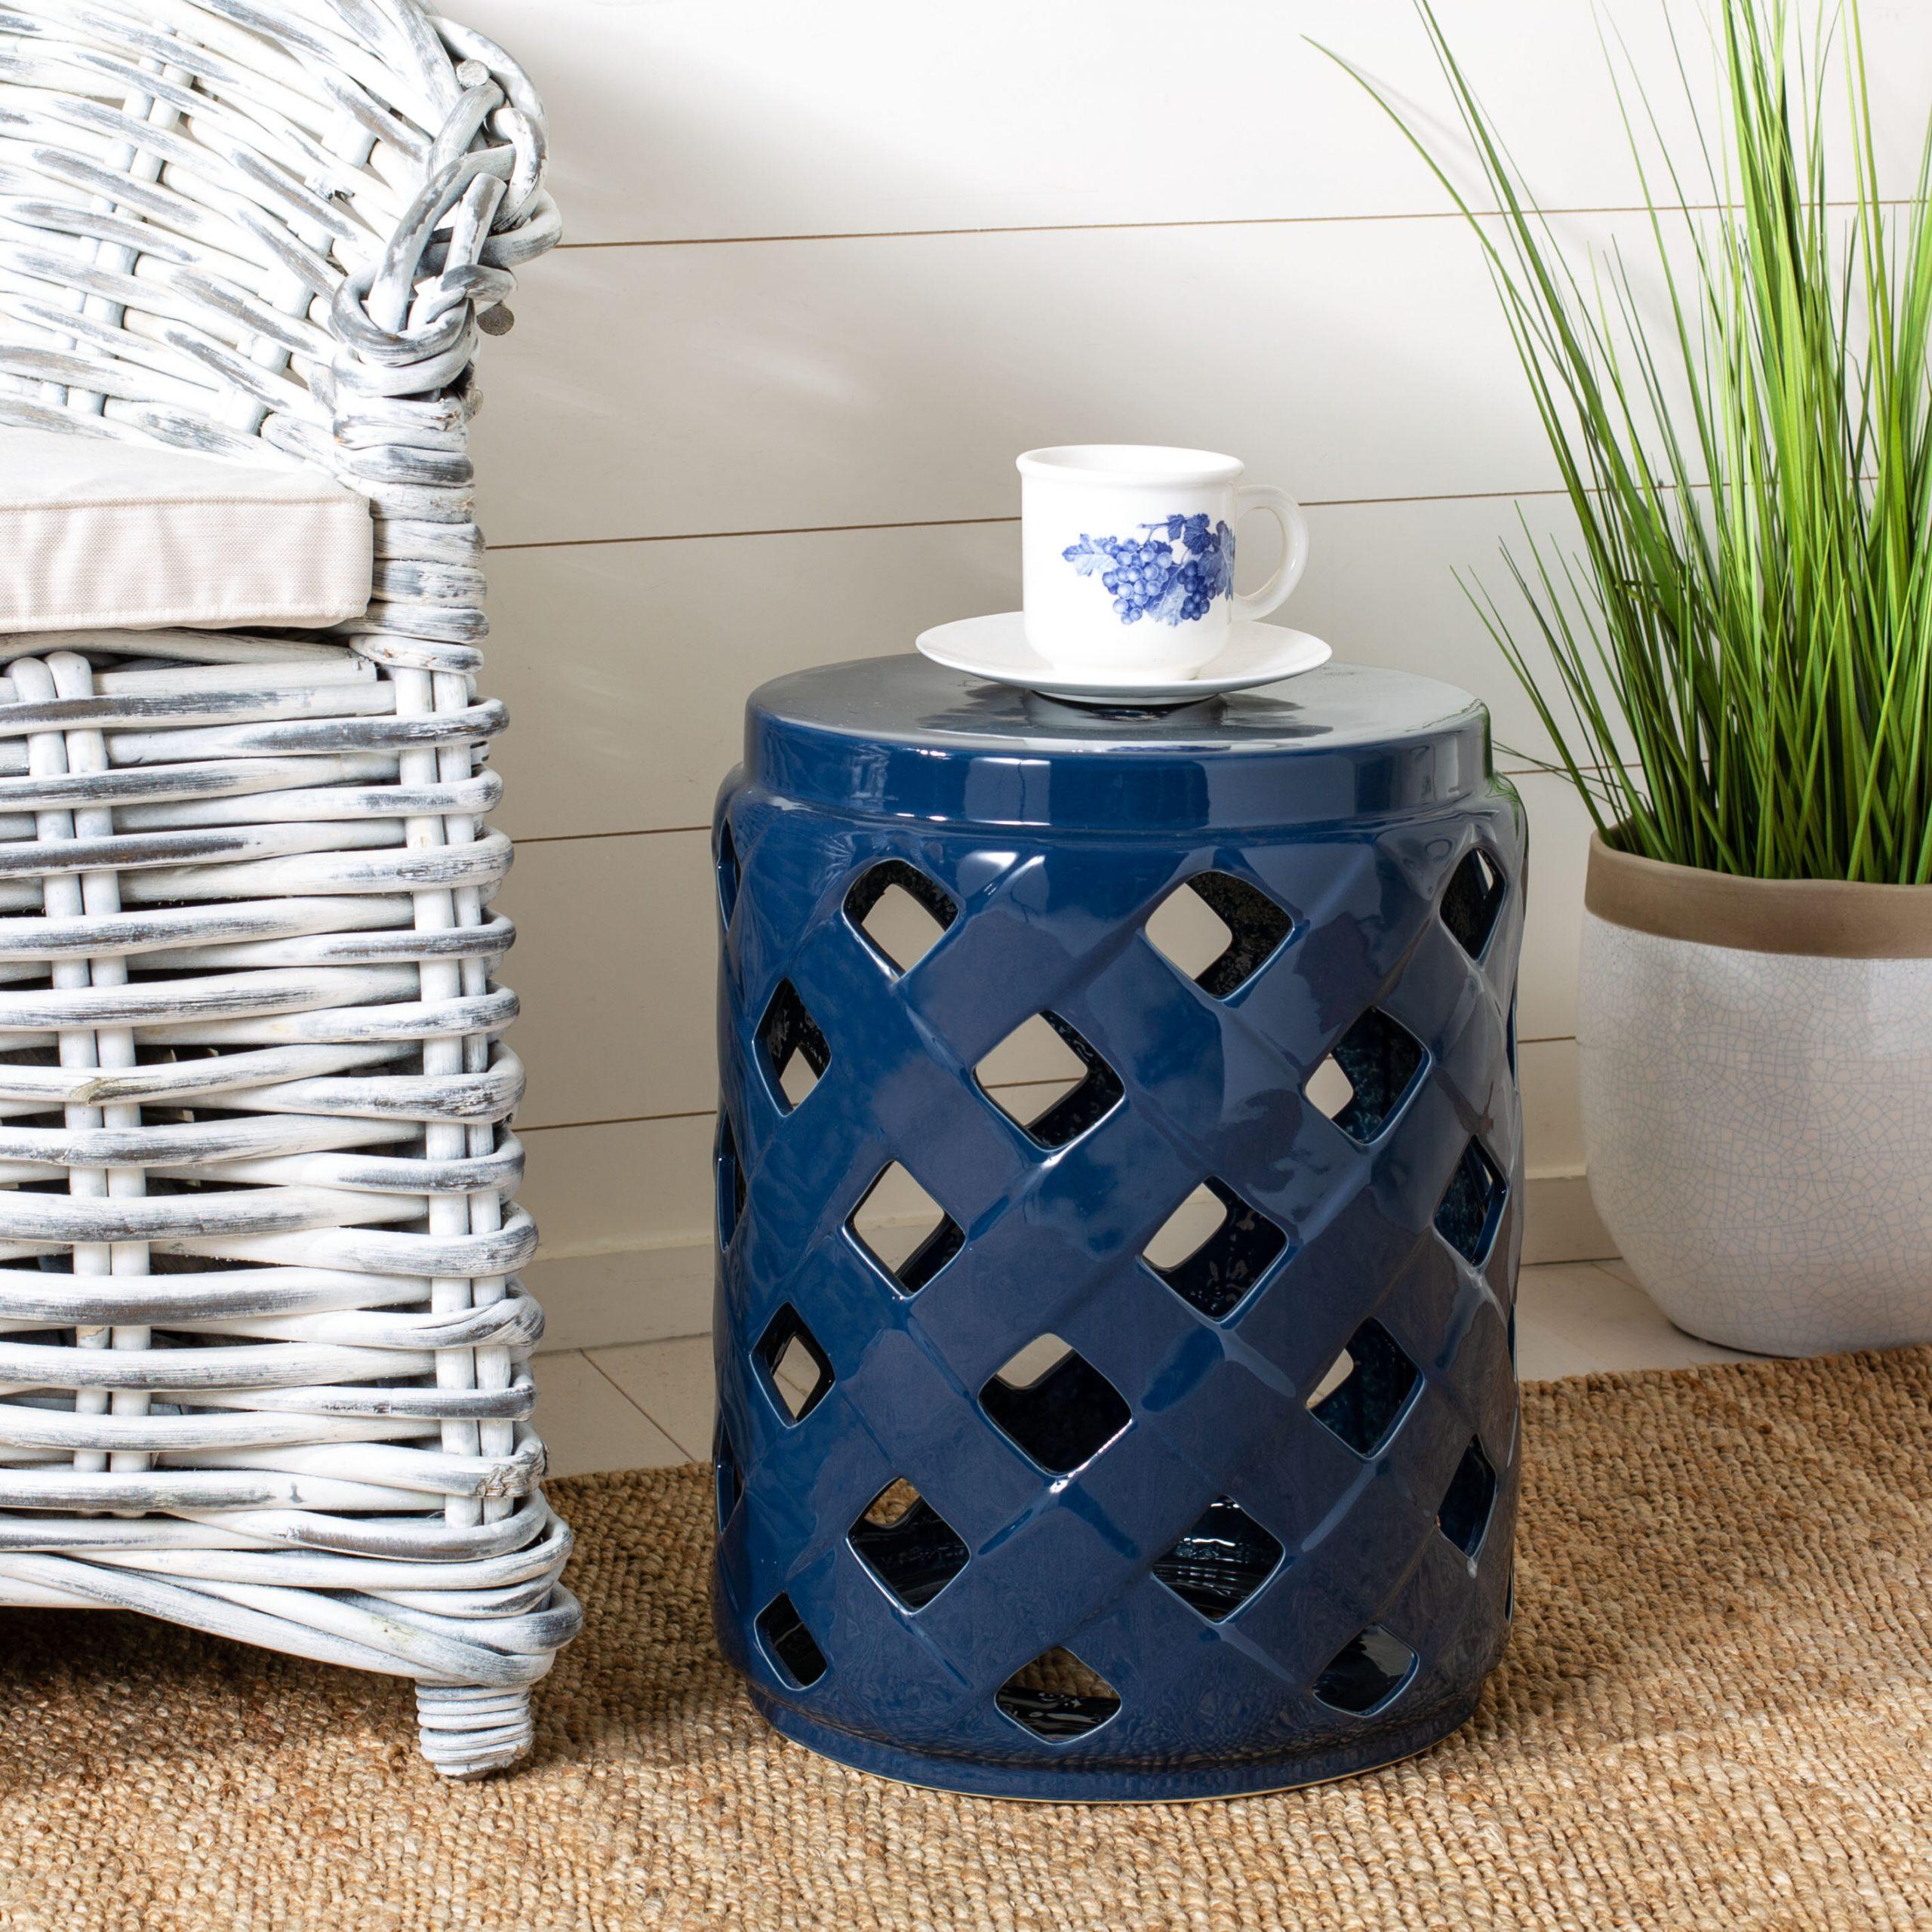 Garden Stools | Wayfair Pertaining To Murphy Ceramic Garden Stools (View 20 of 25)